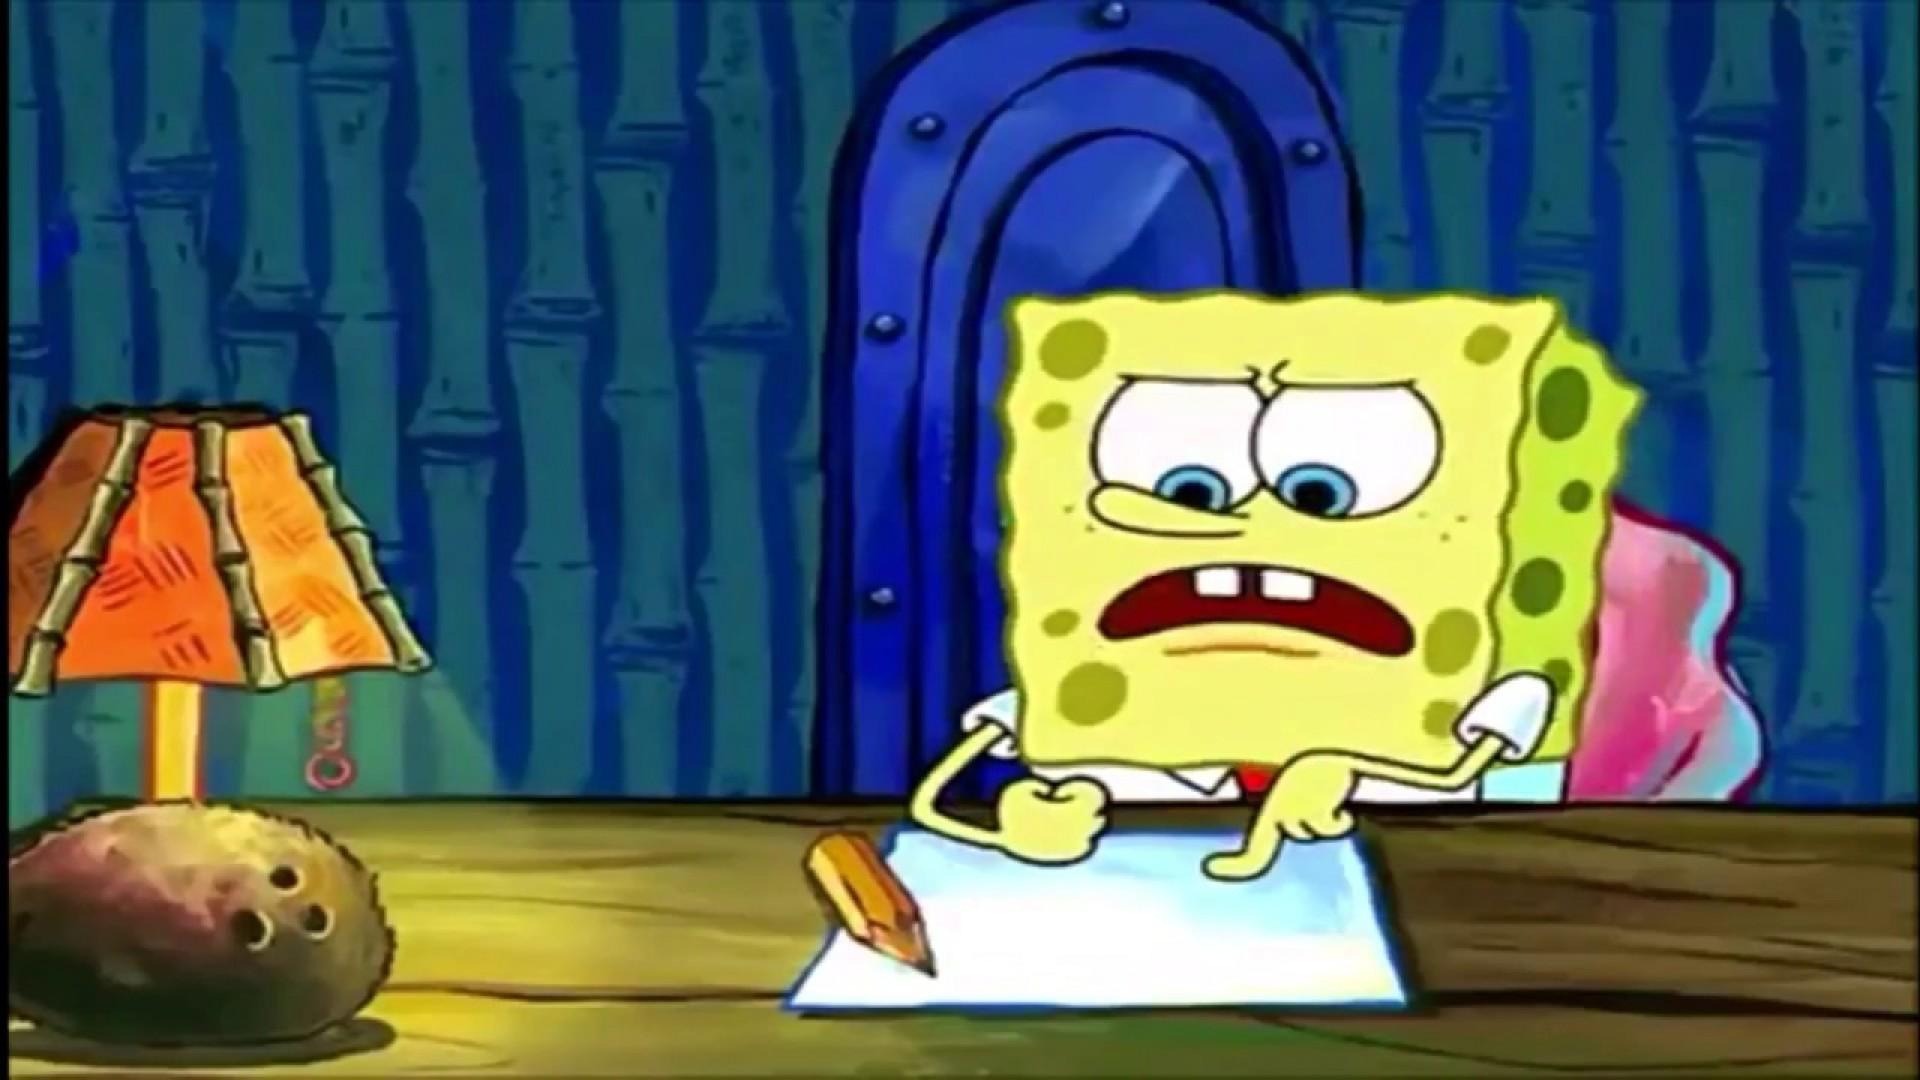 012 Essay Example Spongebob The Unforgettable Copy And Paste Meme Gif Tumblr 1920